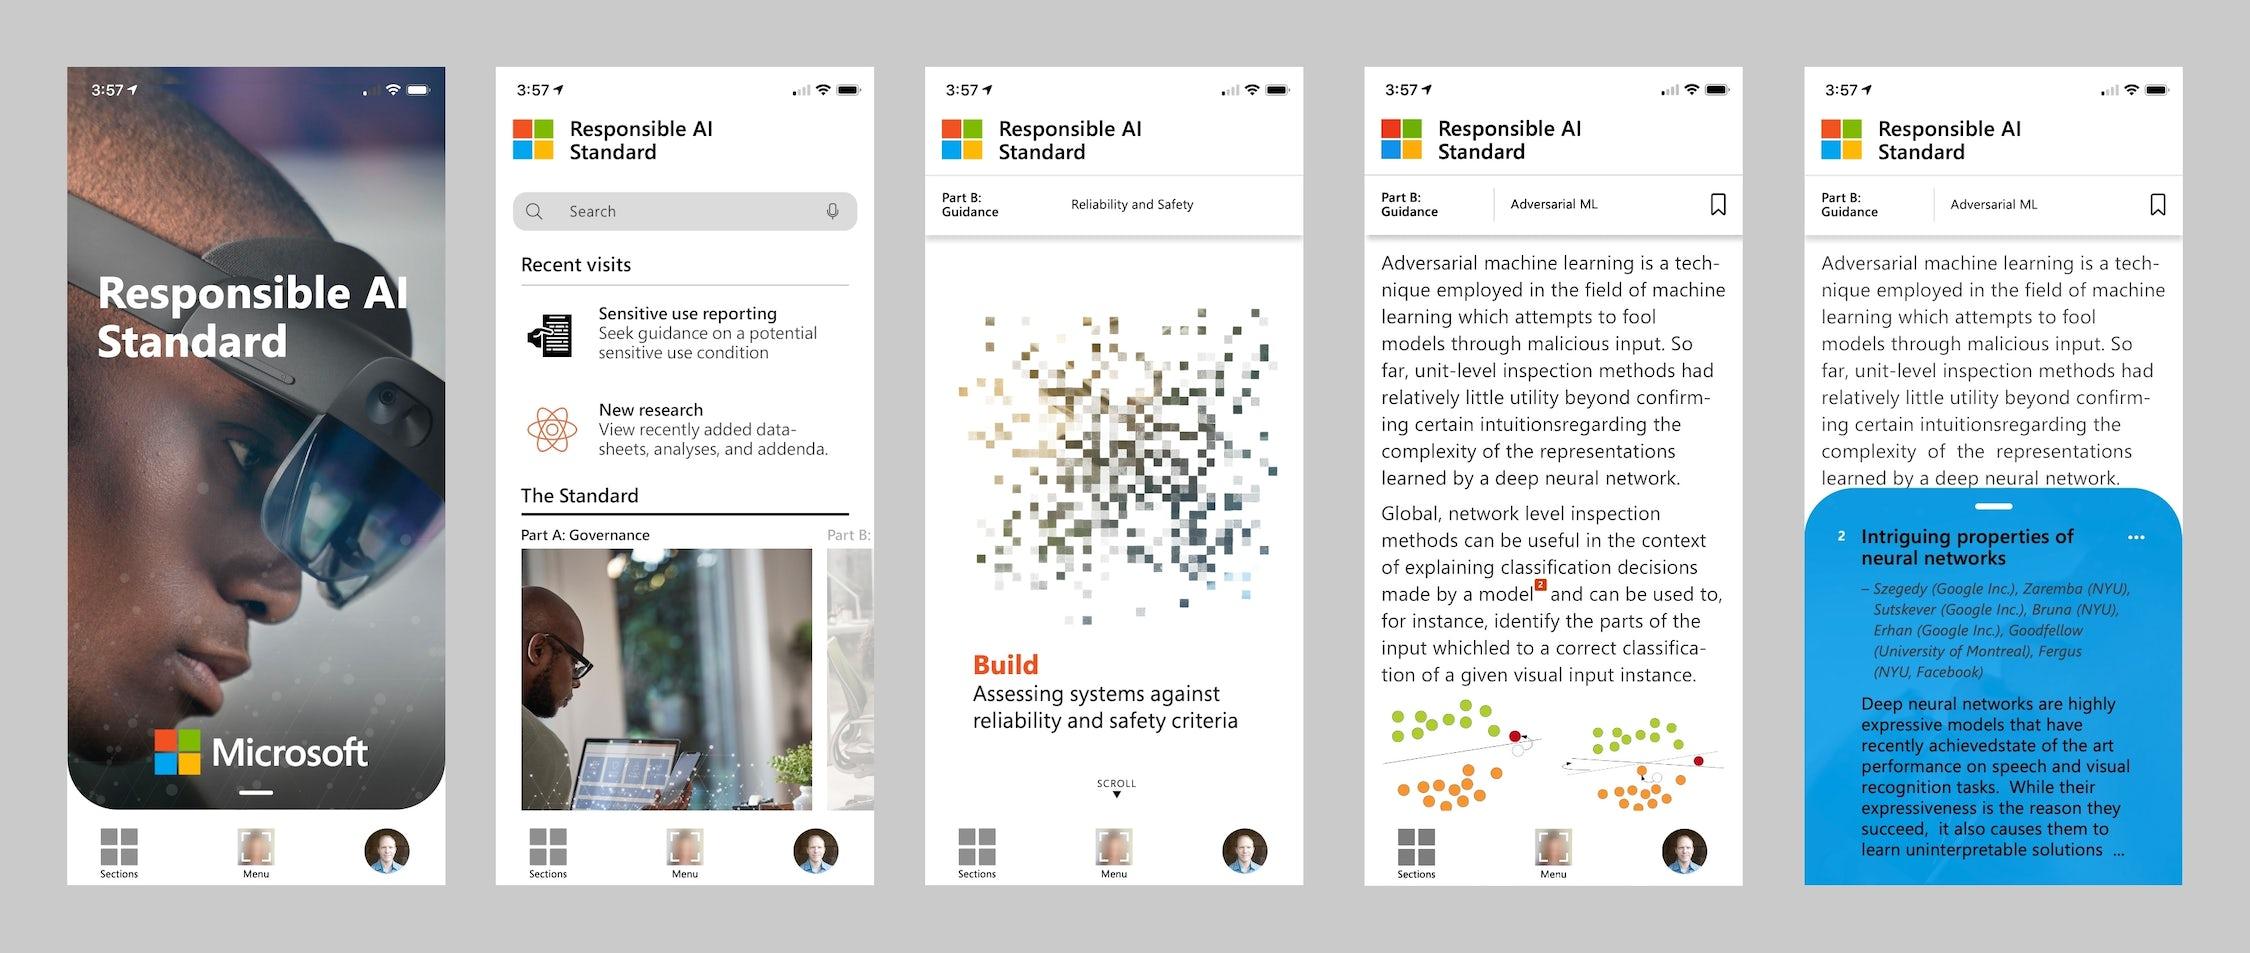 Microsoft Responsible AI app design